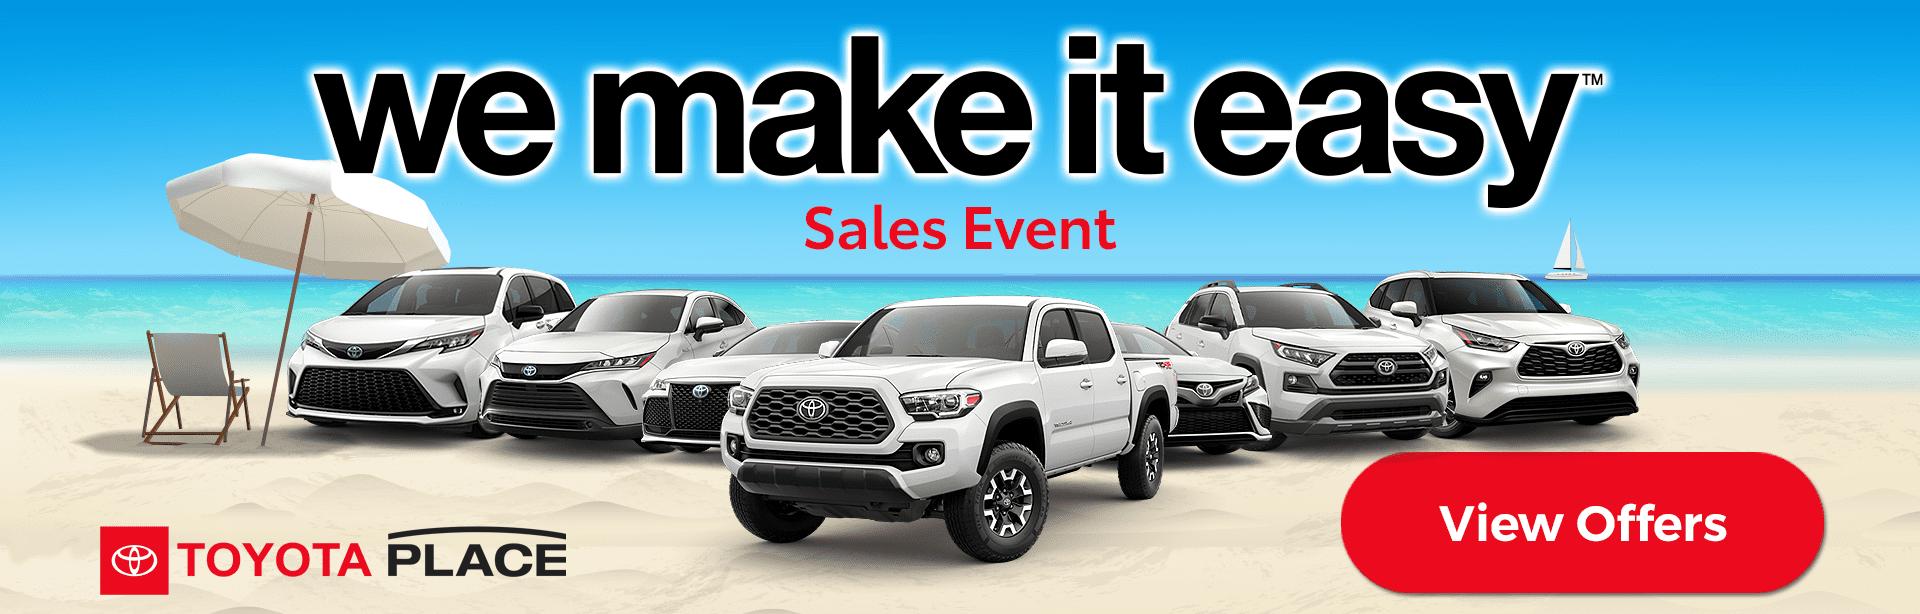 tp_2021_July_WeMakeitEasy_Sales_Event